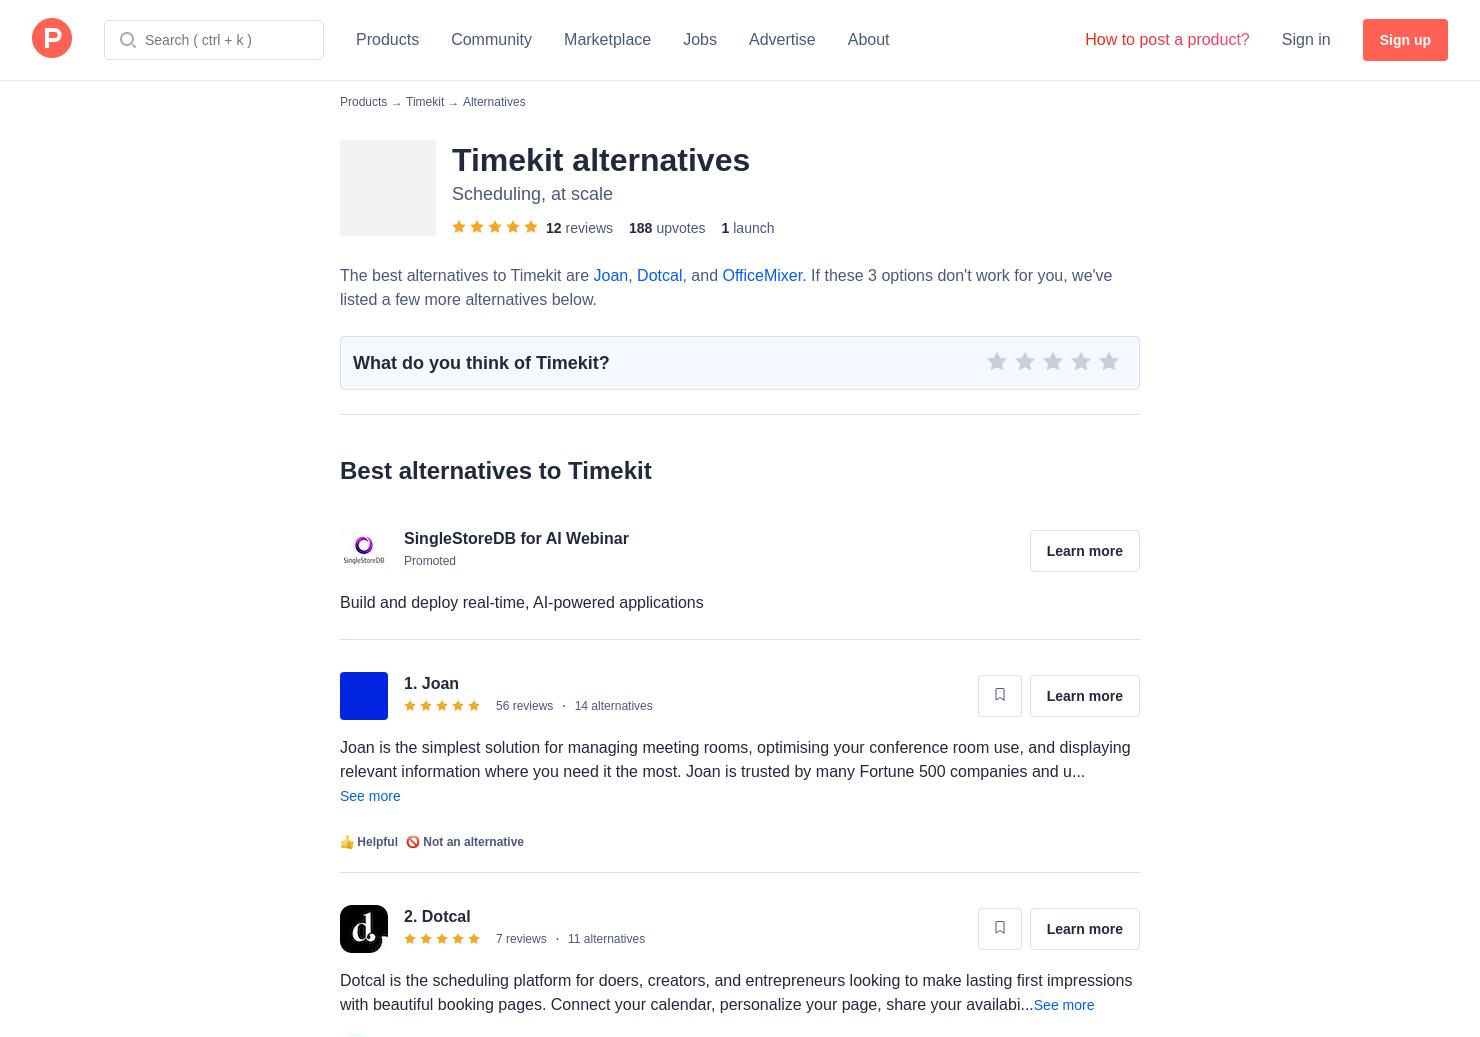 9 Alternatives to Timekit | Product Hunt